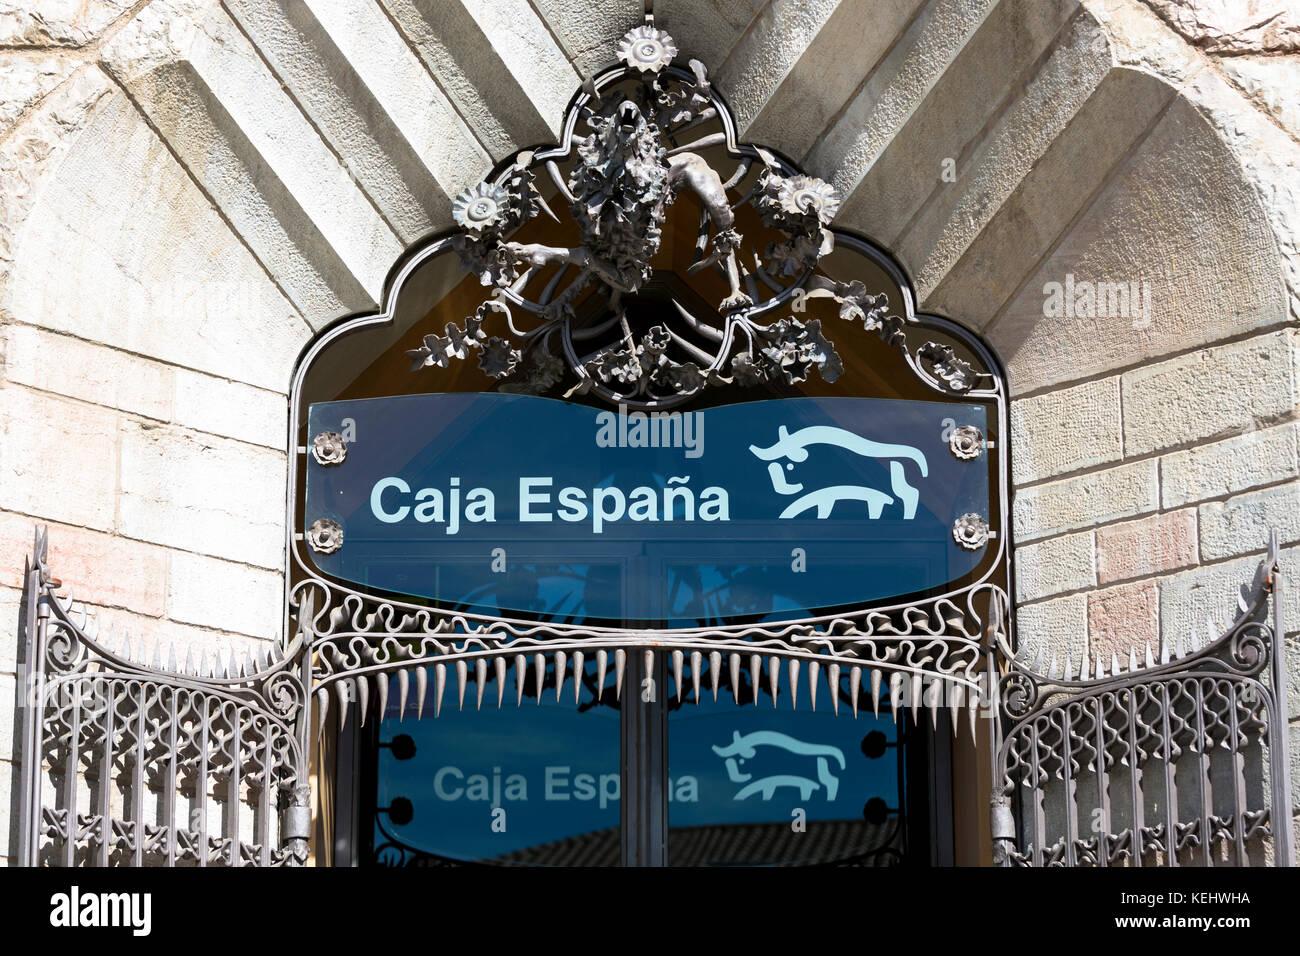 Caja Espana savings bank in Casa Botines designed by architect Antoni Gaud in Leon, Castilla y Leon, Spain - Stock Image